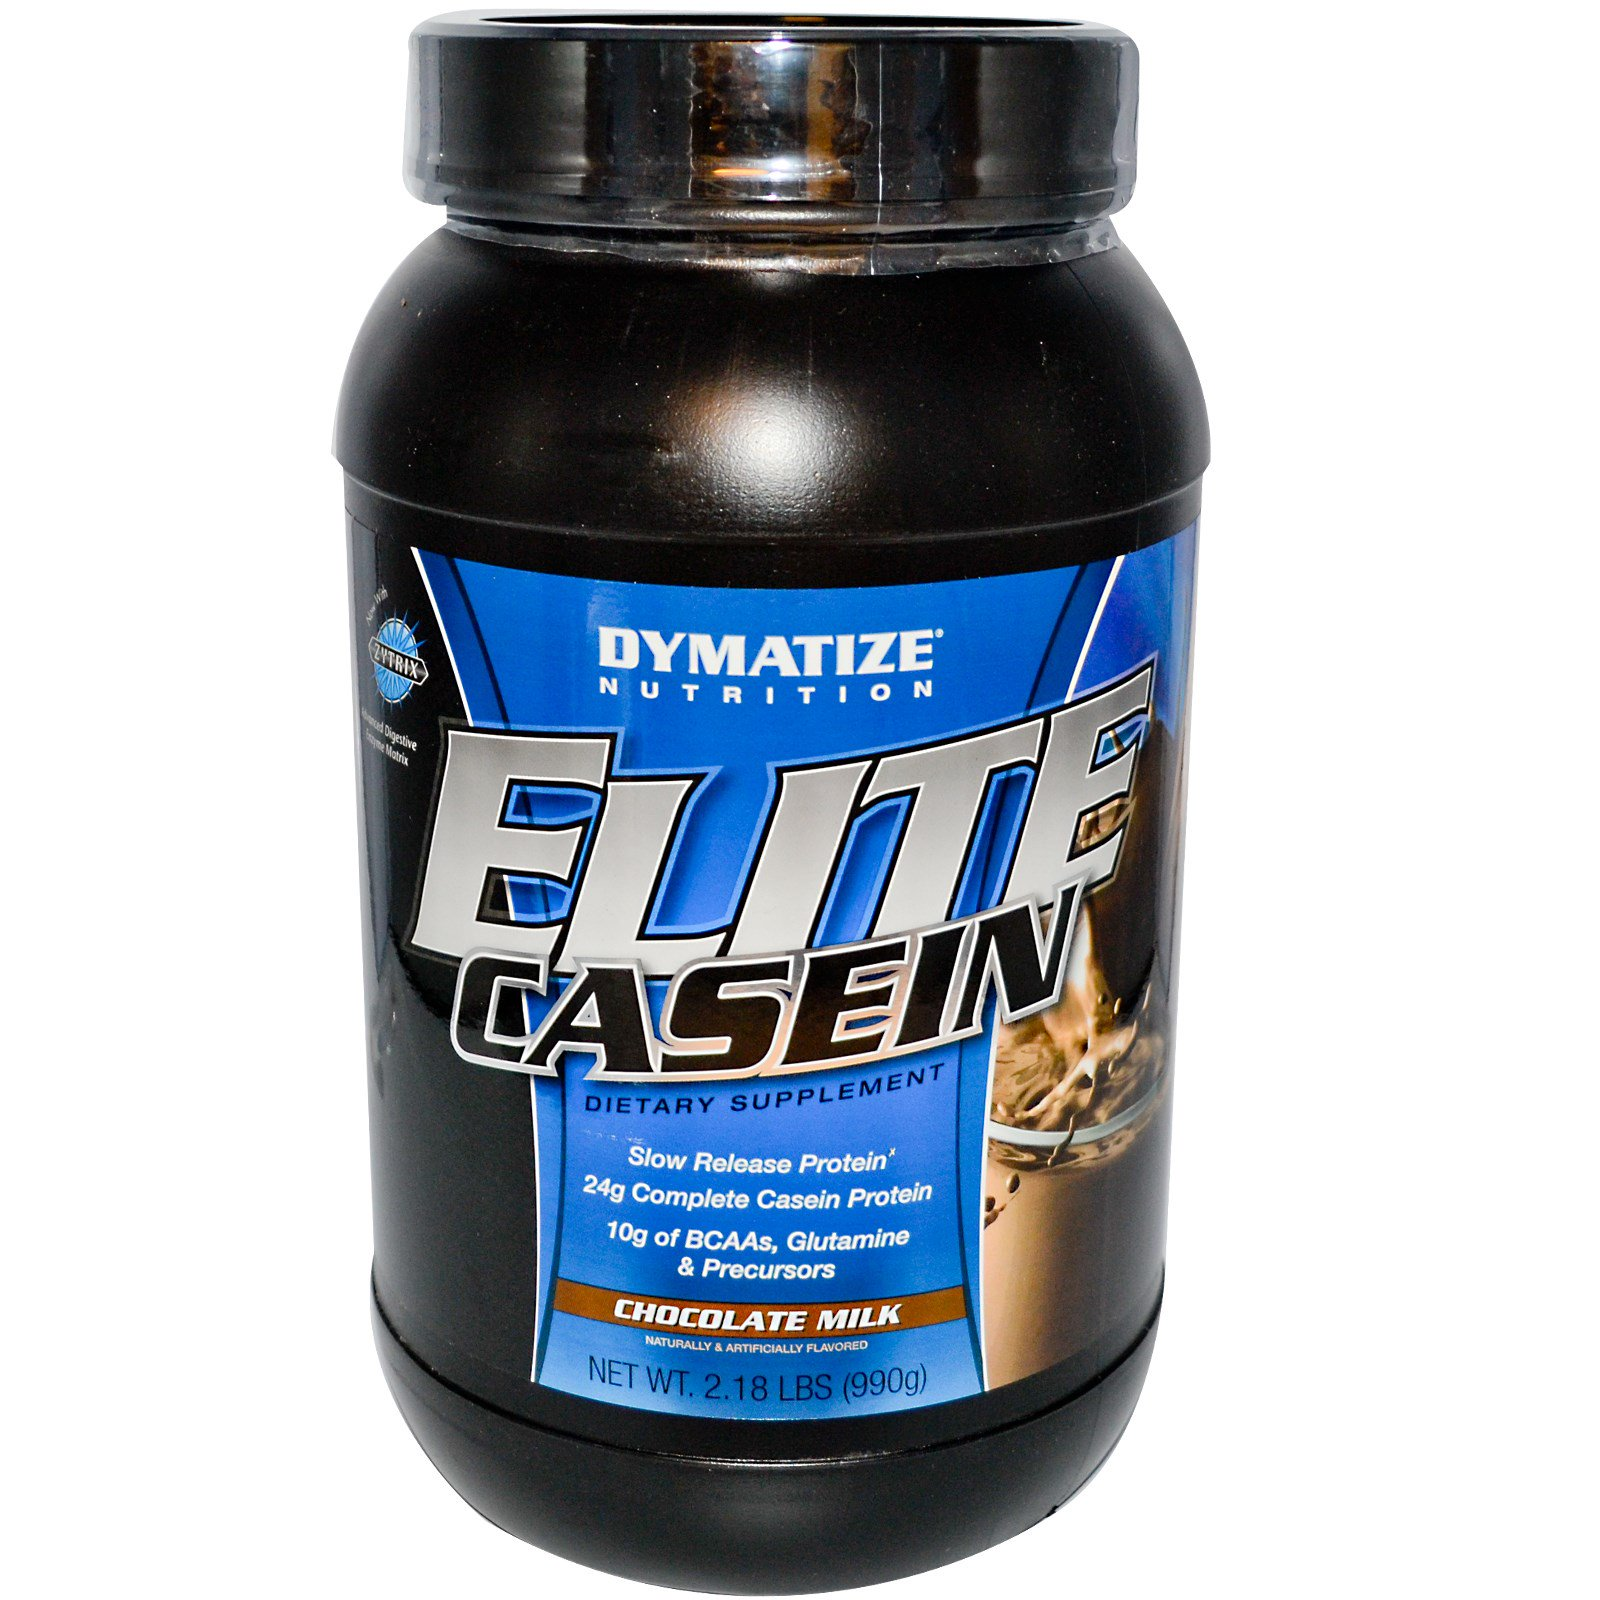 Dymatize Elite Casein Nutrition Facts - Nutrition Ftempo